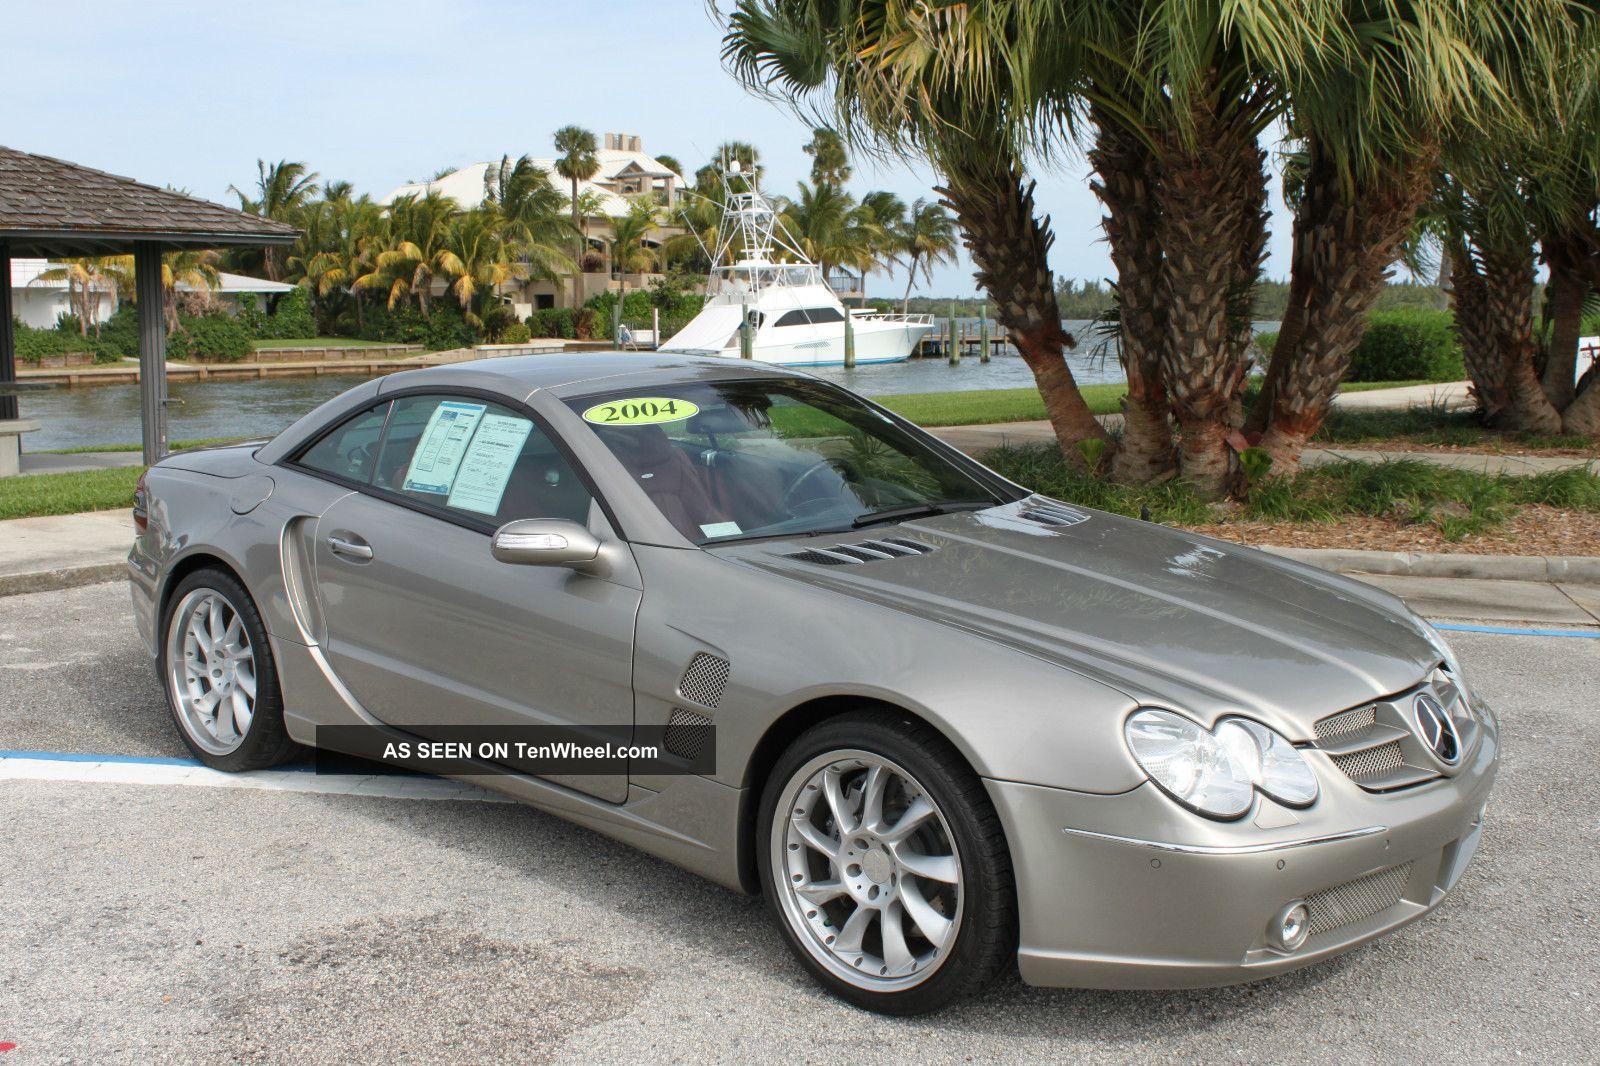 2004 mercedes benz sl55 amg lorinser for Mercedes benz sl55 amg specs